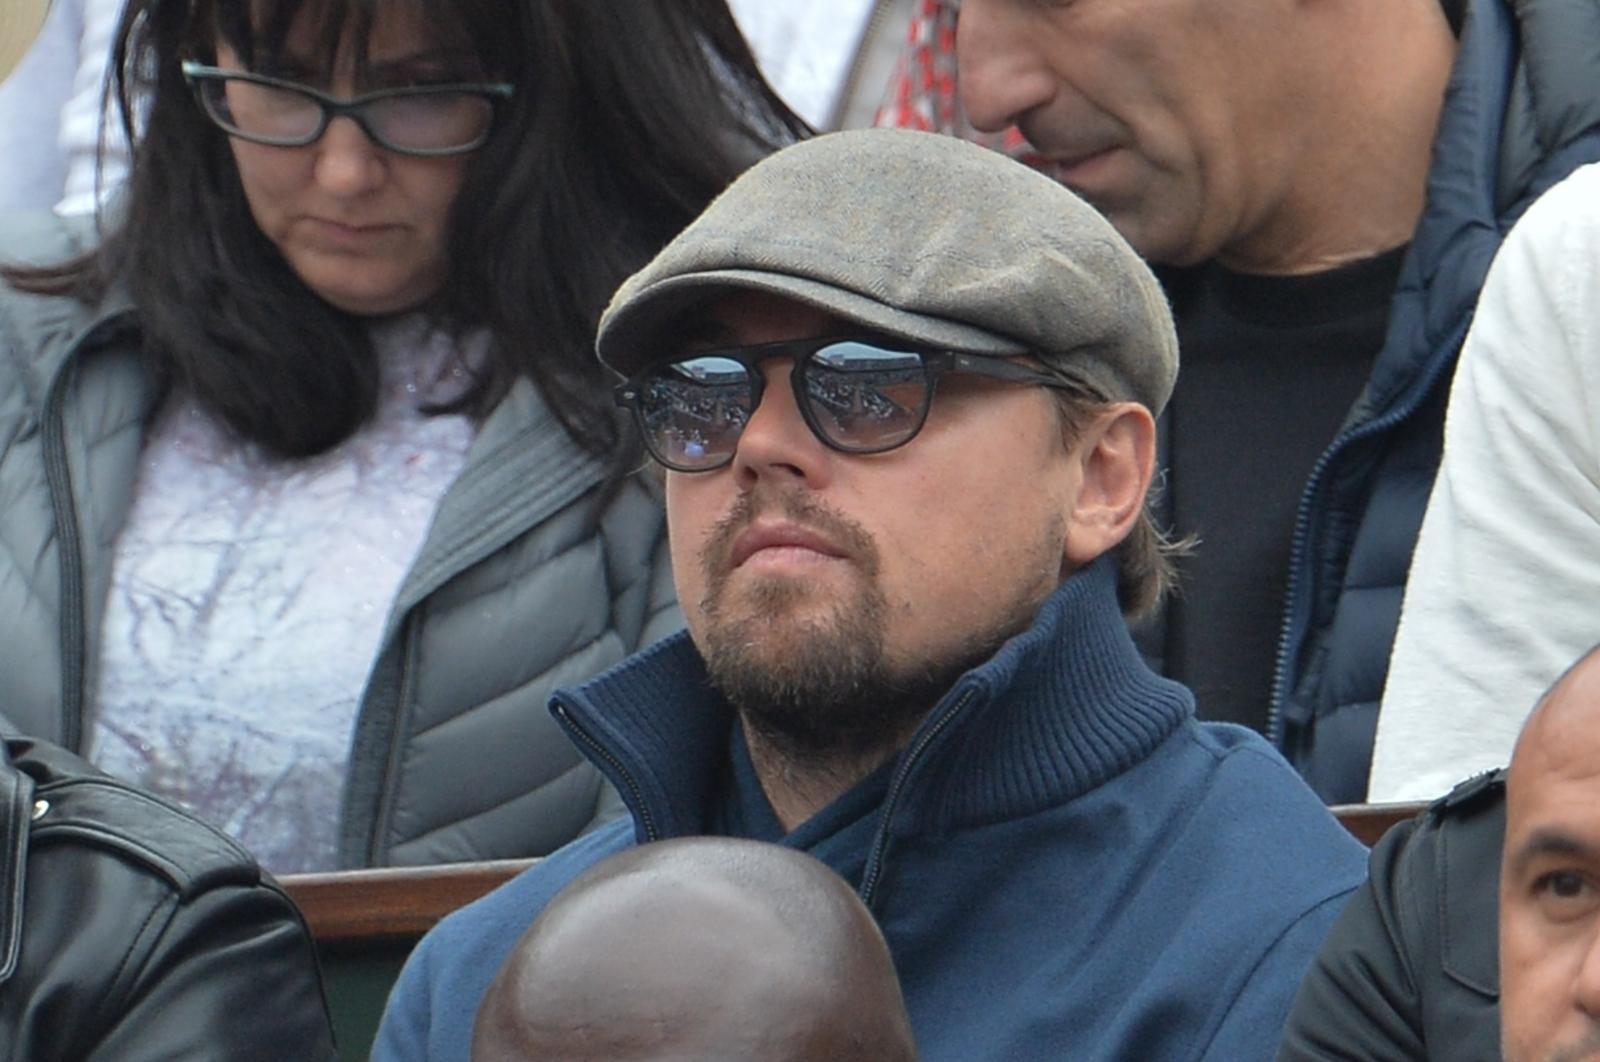 Leonardo DiCaprio leaves St Tropez club with women Adrien Brody Movies